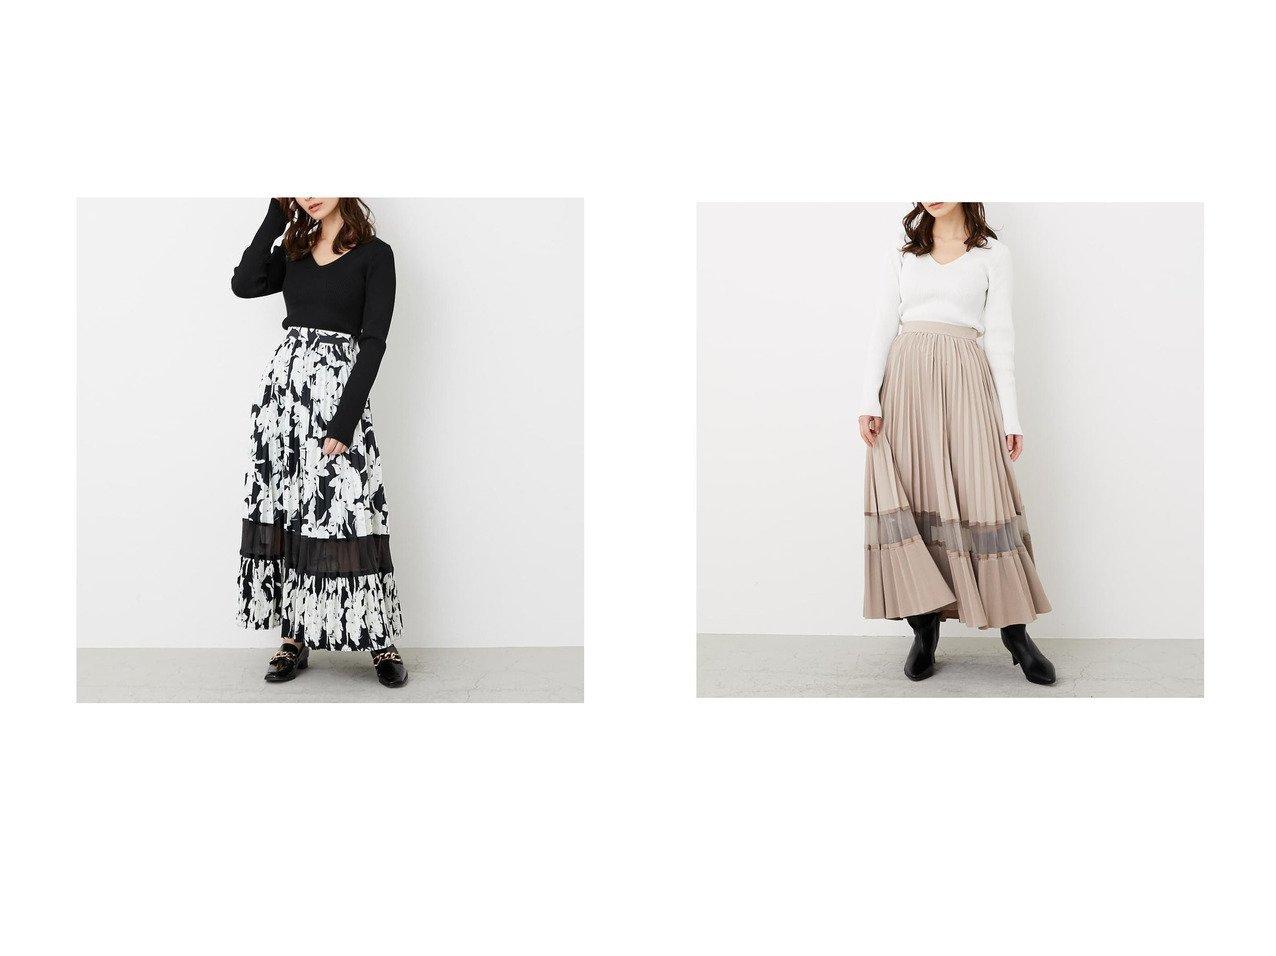 【rienda/リエンダ】のシアーボーダープリーツWフレアSK マルチ&シアーボーダープリーツWフレアSK SLYのおすすめ!人気、トレンド・レディースファッションの通販 おすすめで人気の流行・トレンド、ファッションの通販商品 メンズファッション・キッズファッション・インテリア・家具・レディースファッション・服の通販 founy(ファニー) https://founy.com/ ファッション Fashion レディースファッション WOMEN スカート Skirt 2021年 2021 2021 春夏 S/S SS Spring/Summer 2021 S/S 春夏 SS Spring/Summer オーガンジー フレア プリーツ 春 Spring  ID:crp329100000018472